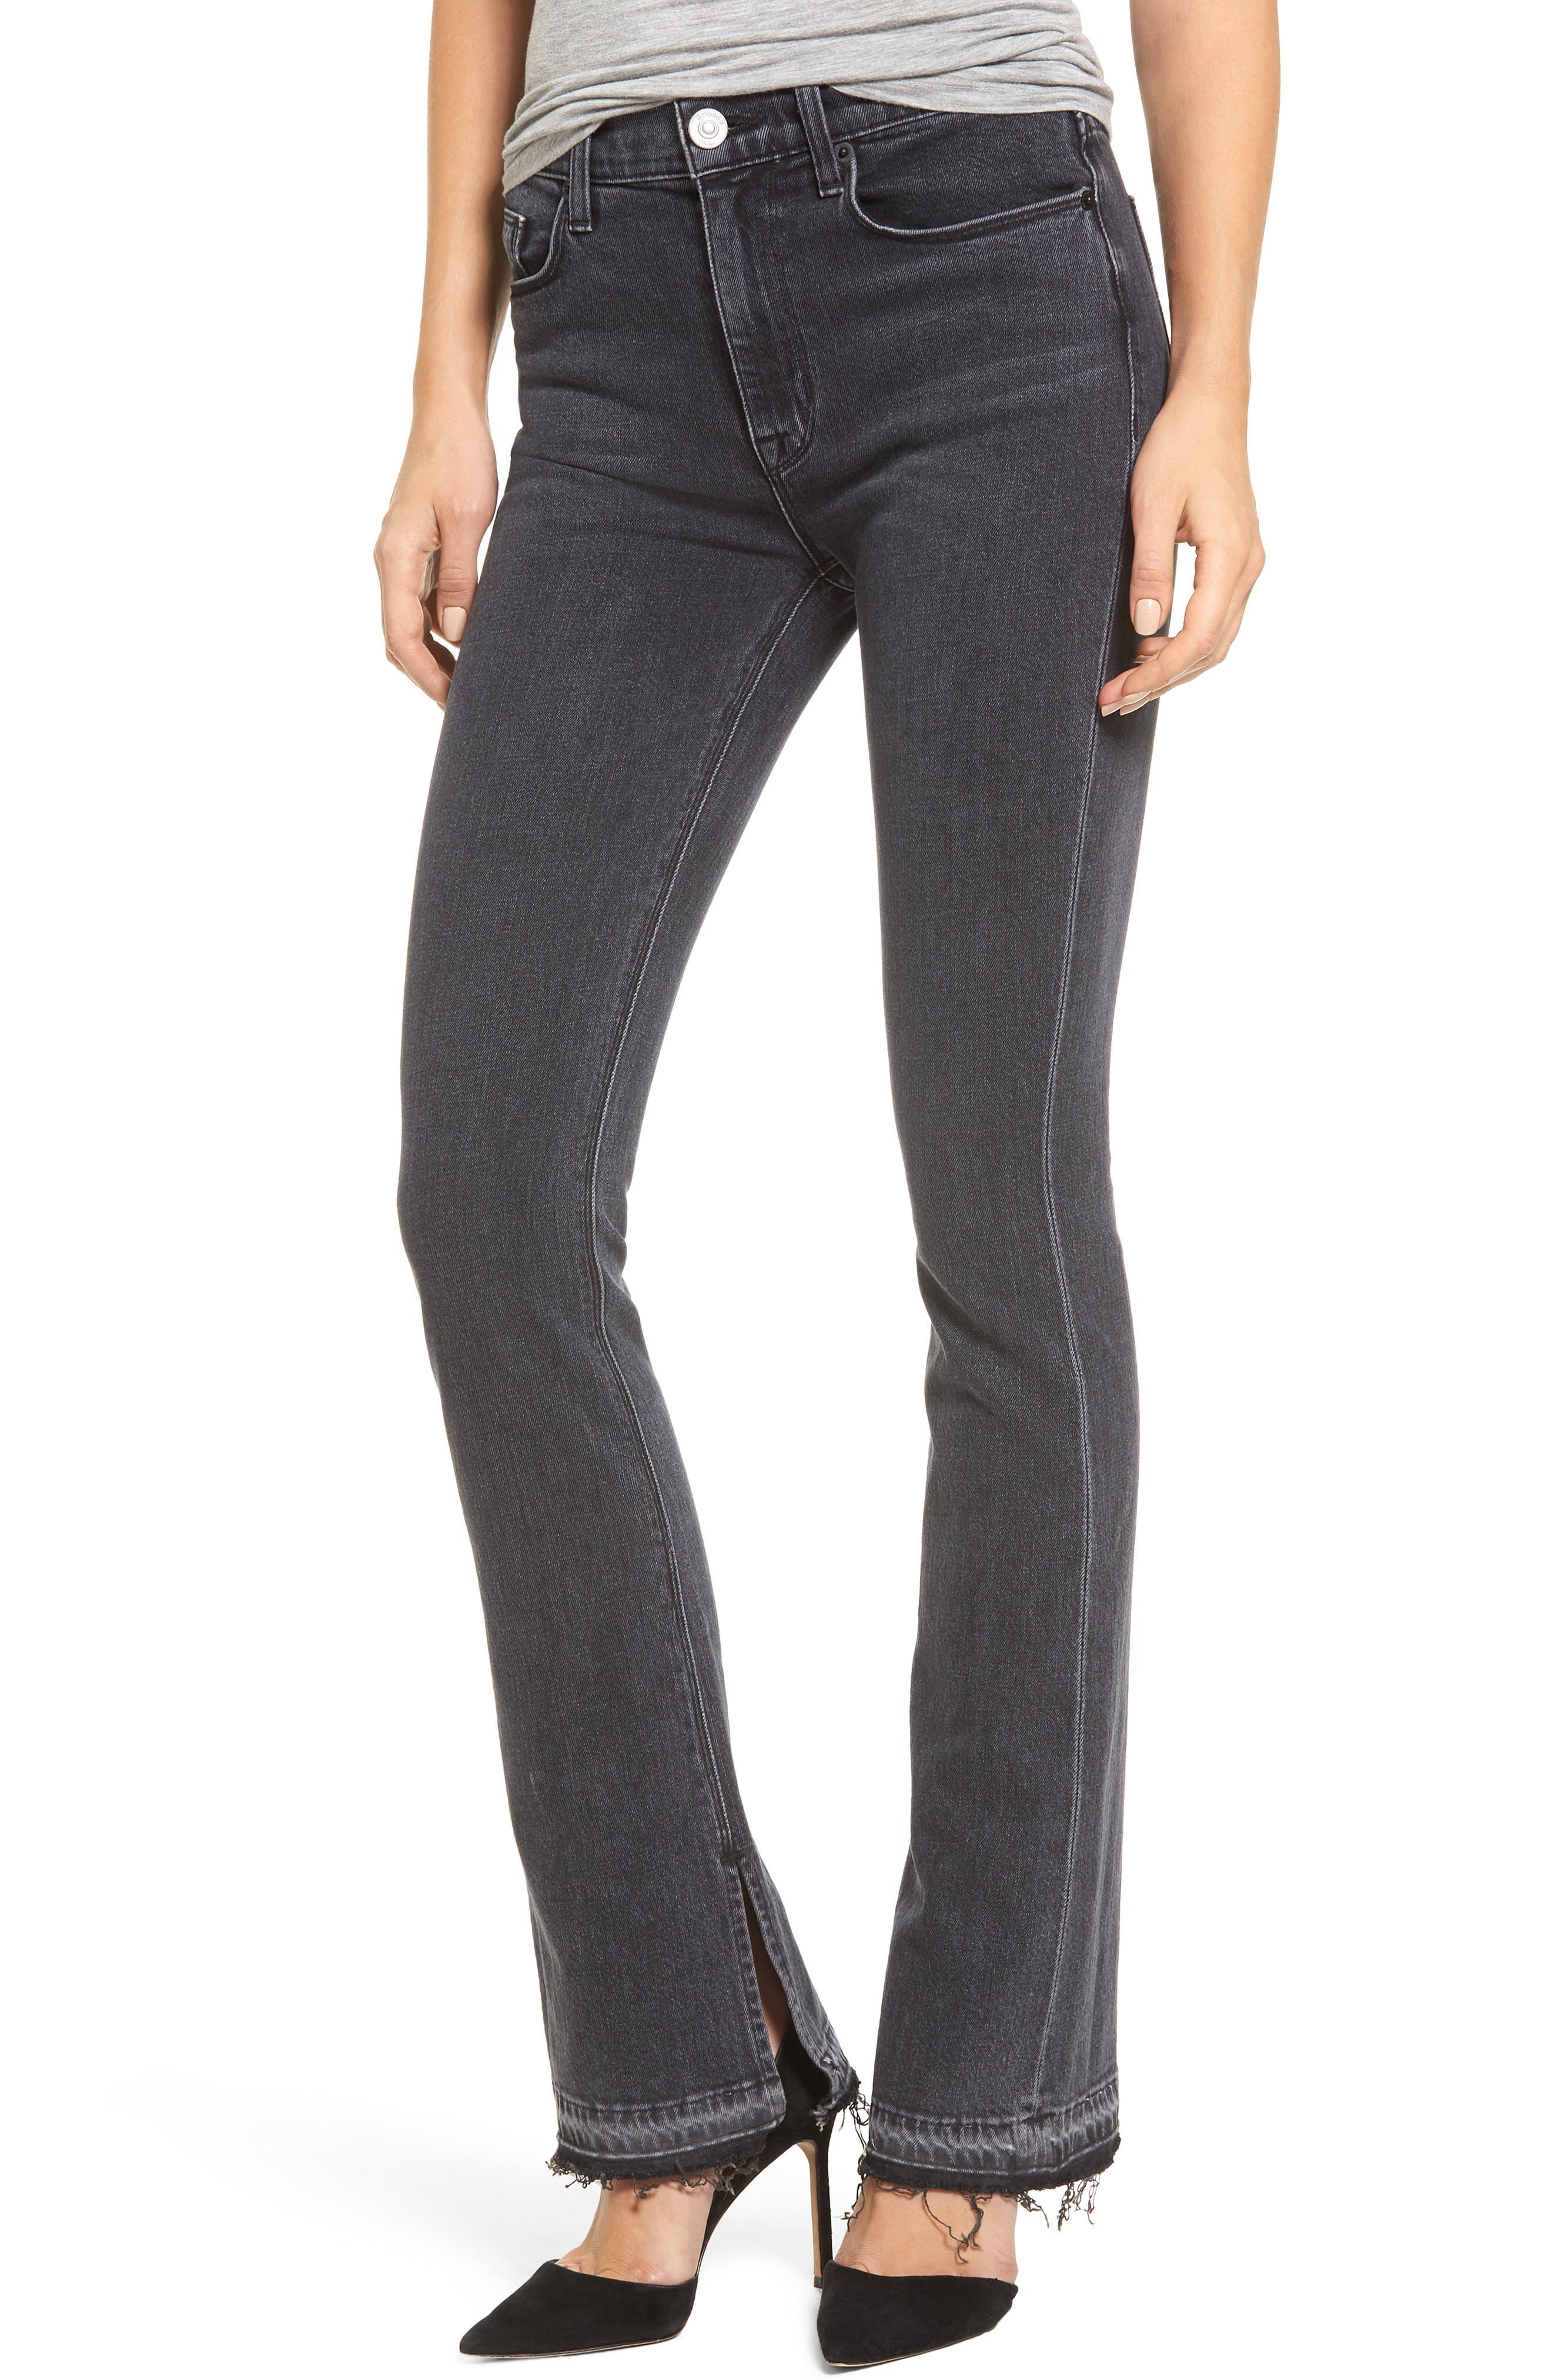 Heartbreaker High Waist Bootcut Jeans,                         Main,                         color, 001